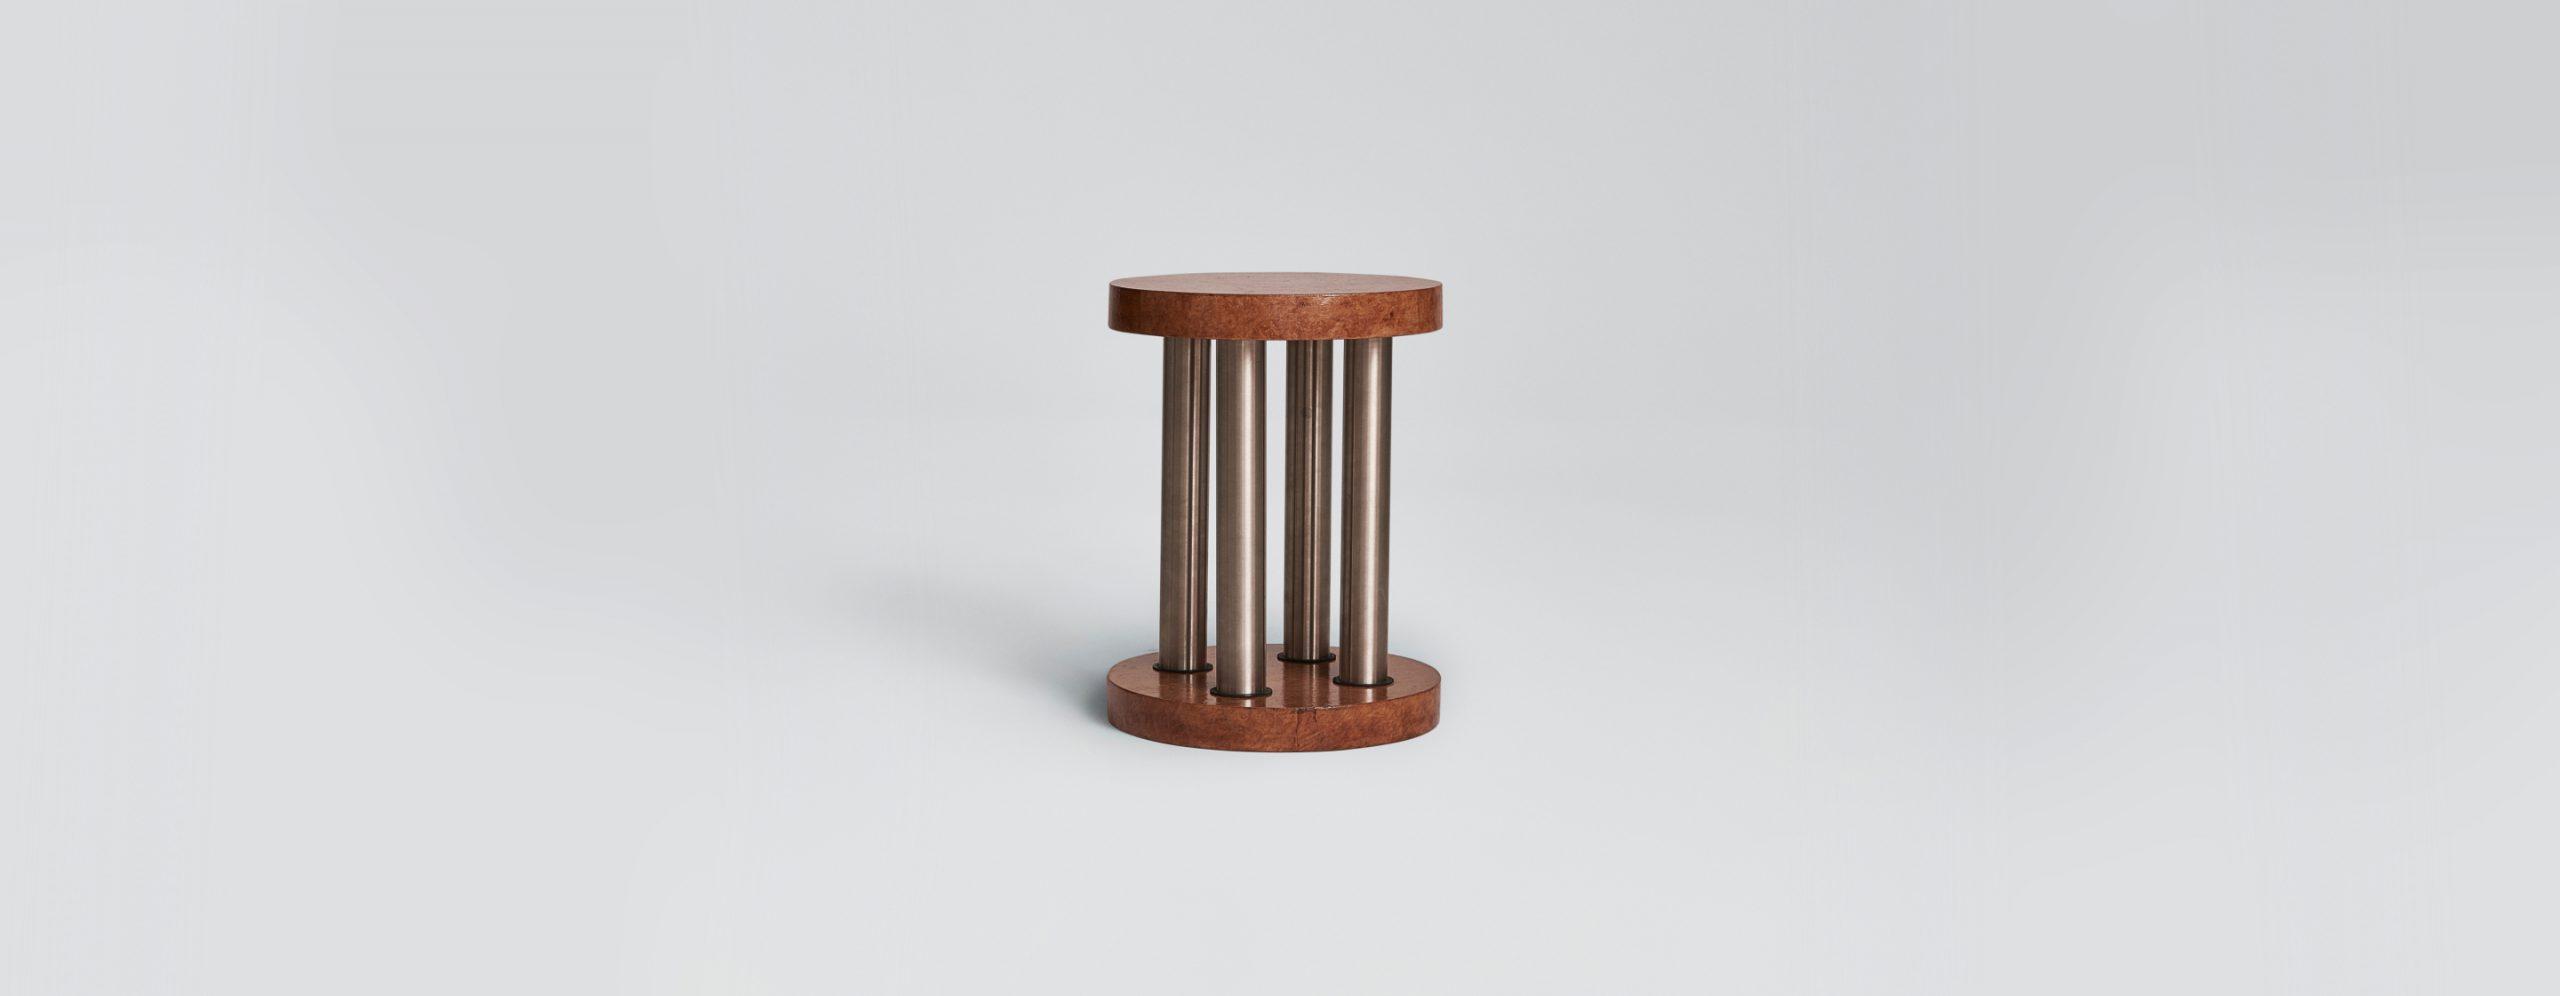 Vavona stainless steel